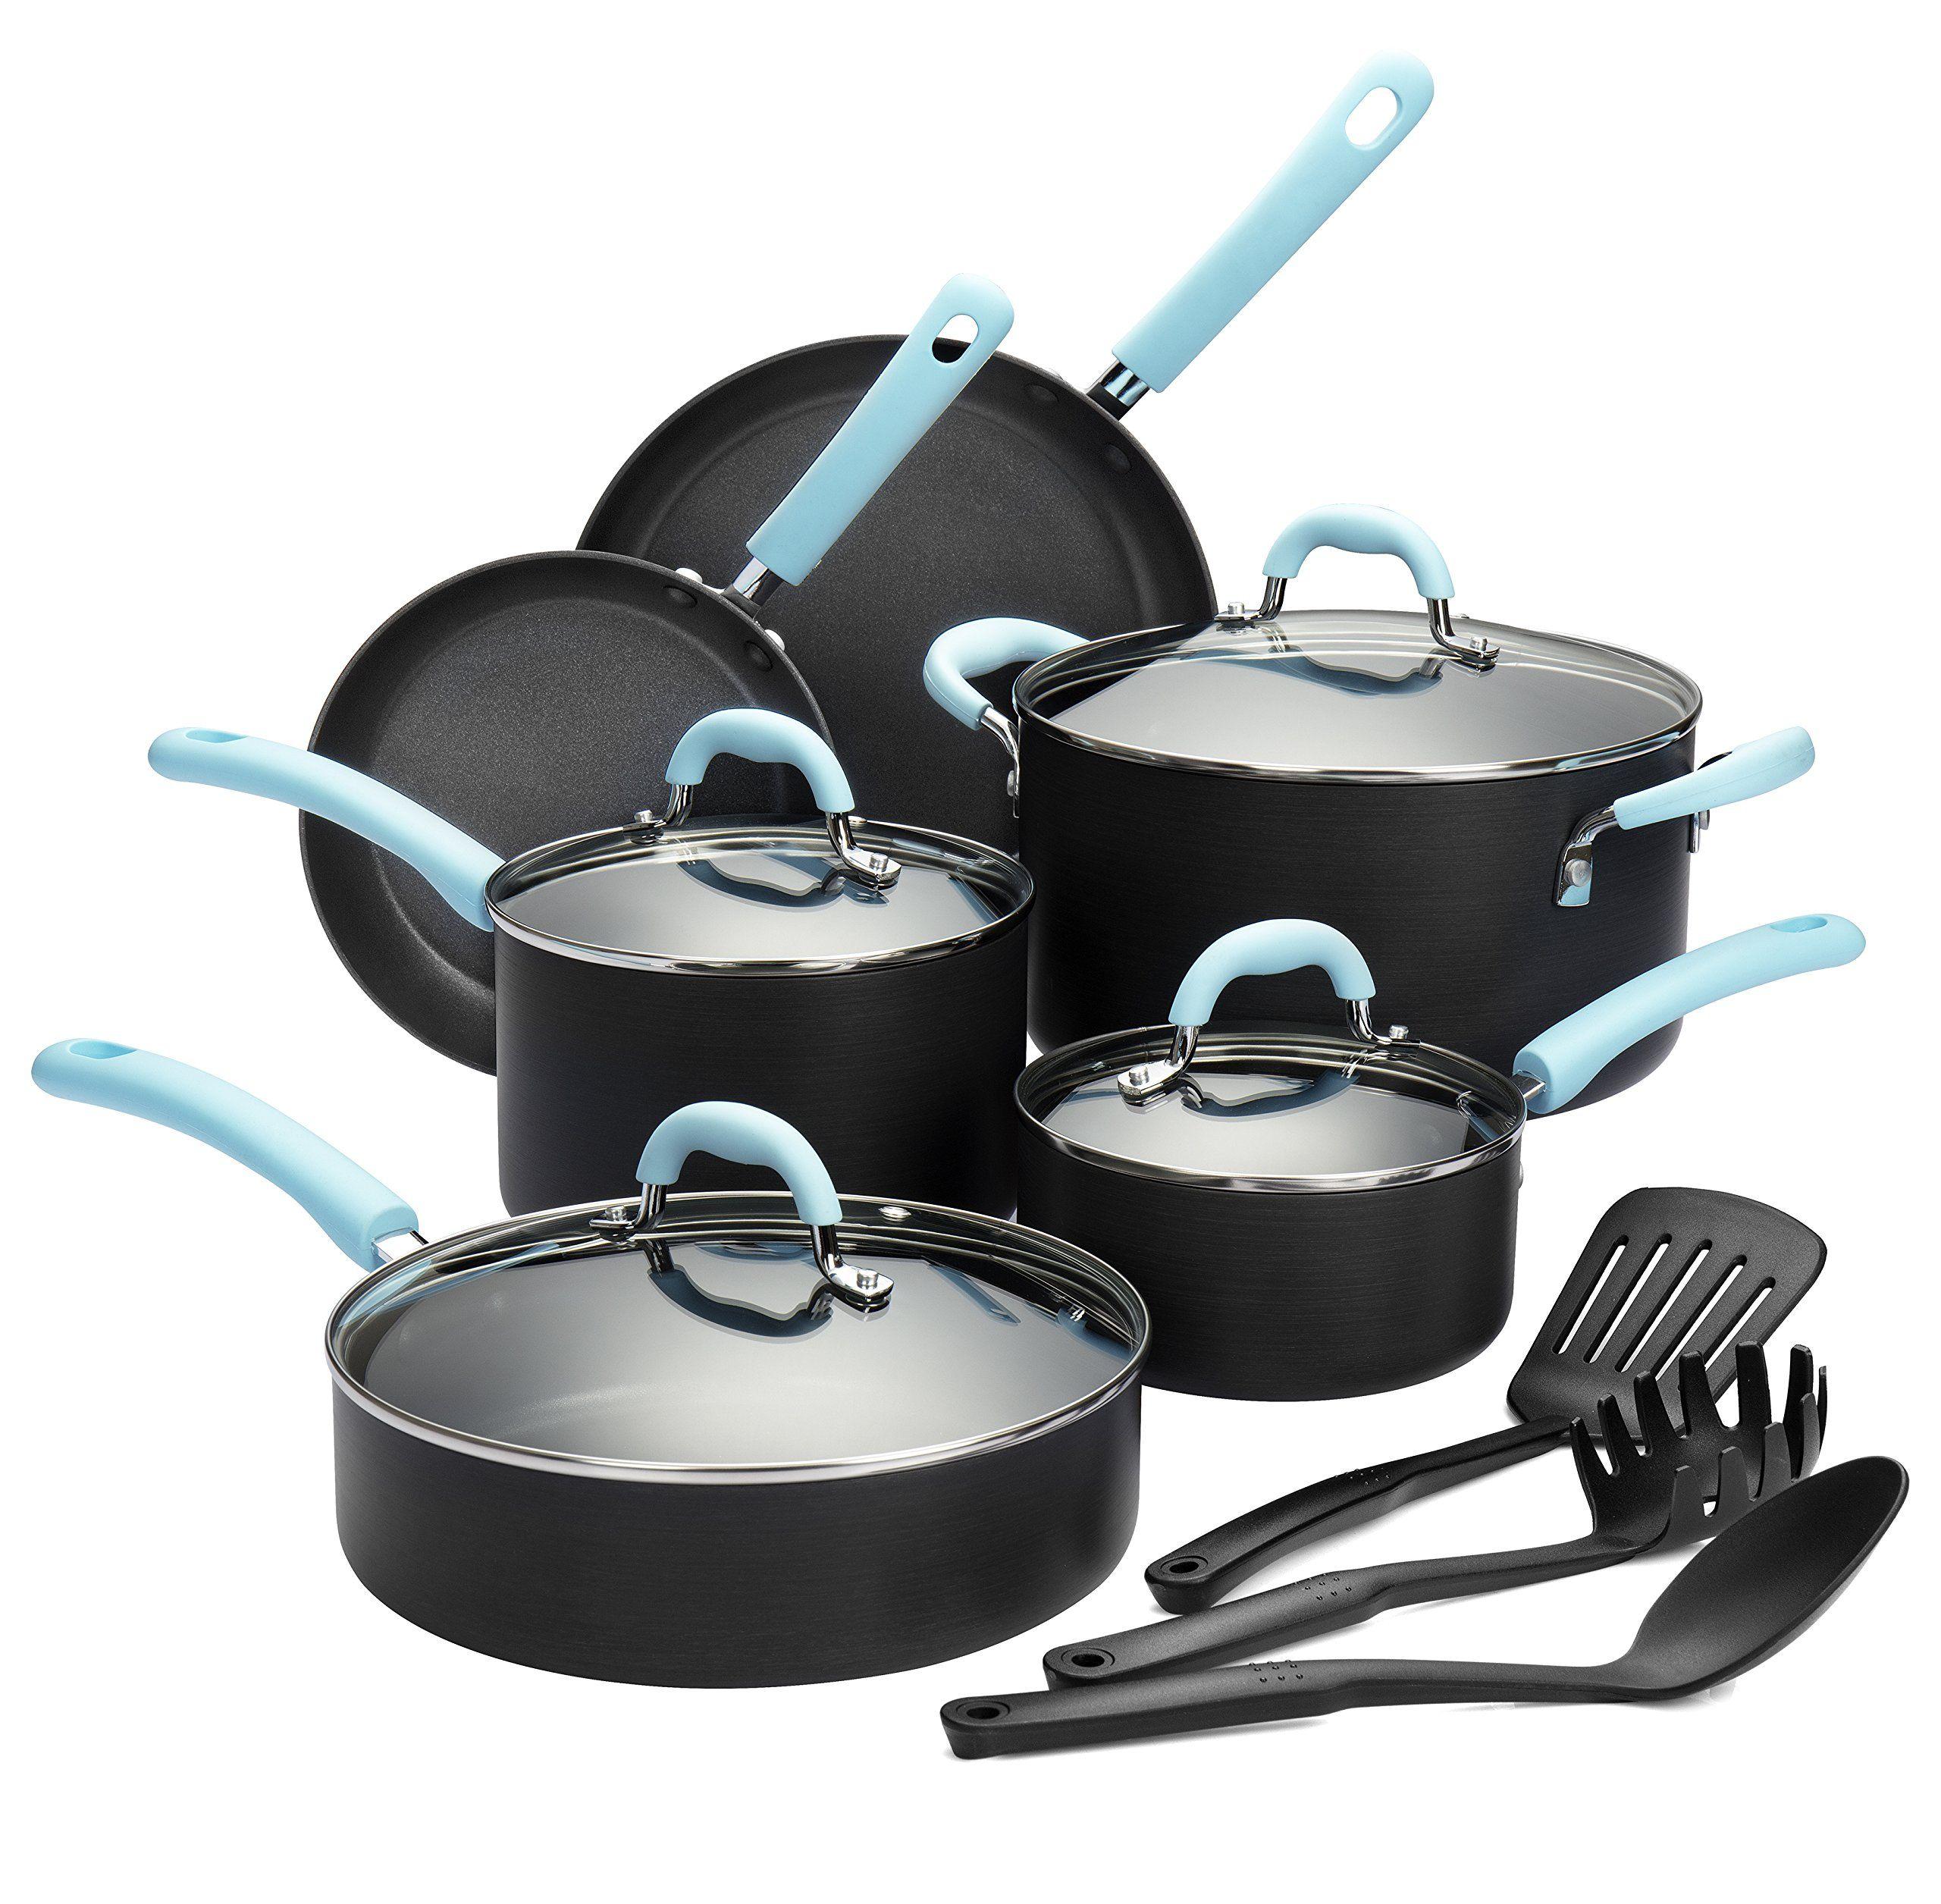 Finnhomy Super Value Hardanodized Aluminum Cookware Set Double